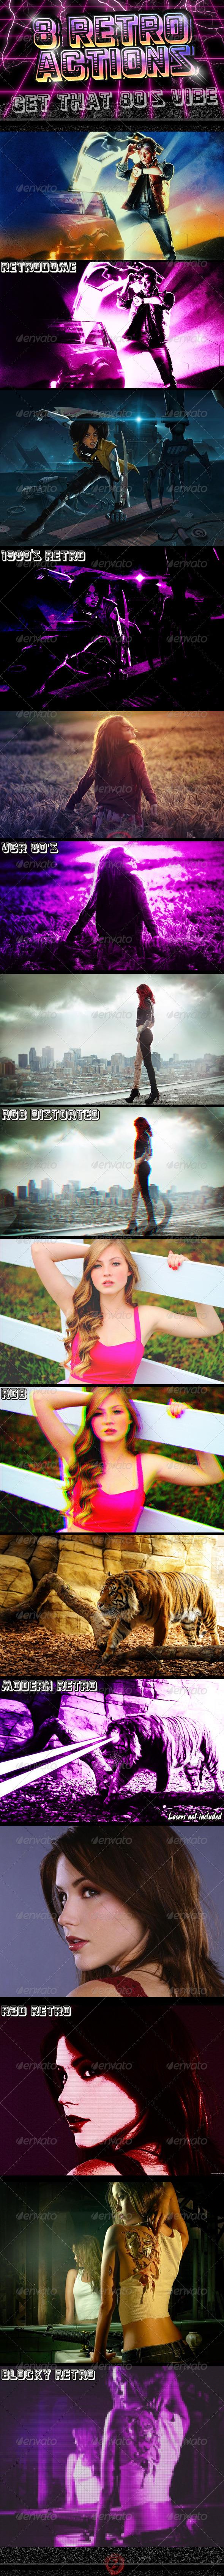 GraphicRiver 8 Photoshop Retro FX 4586190